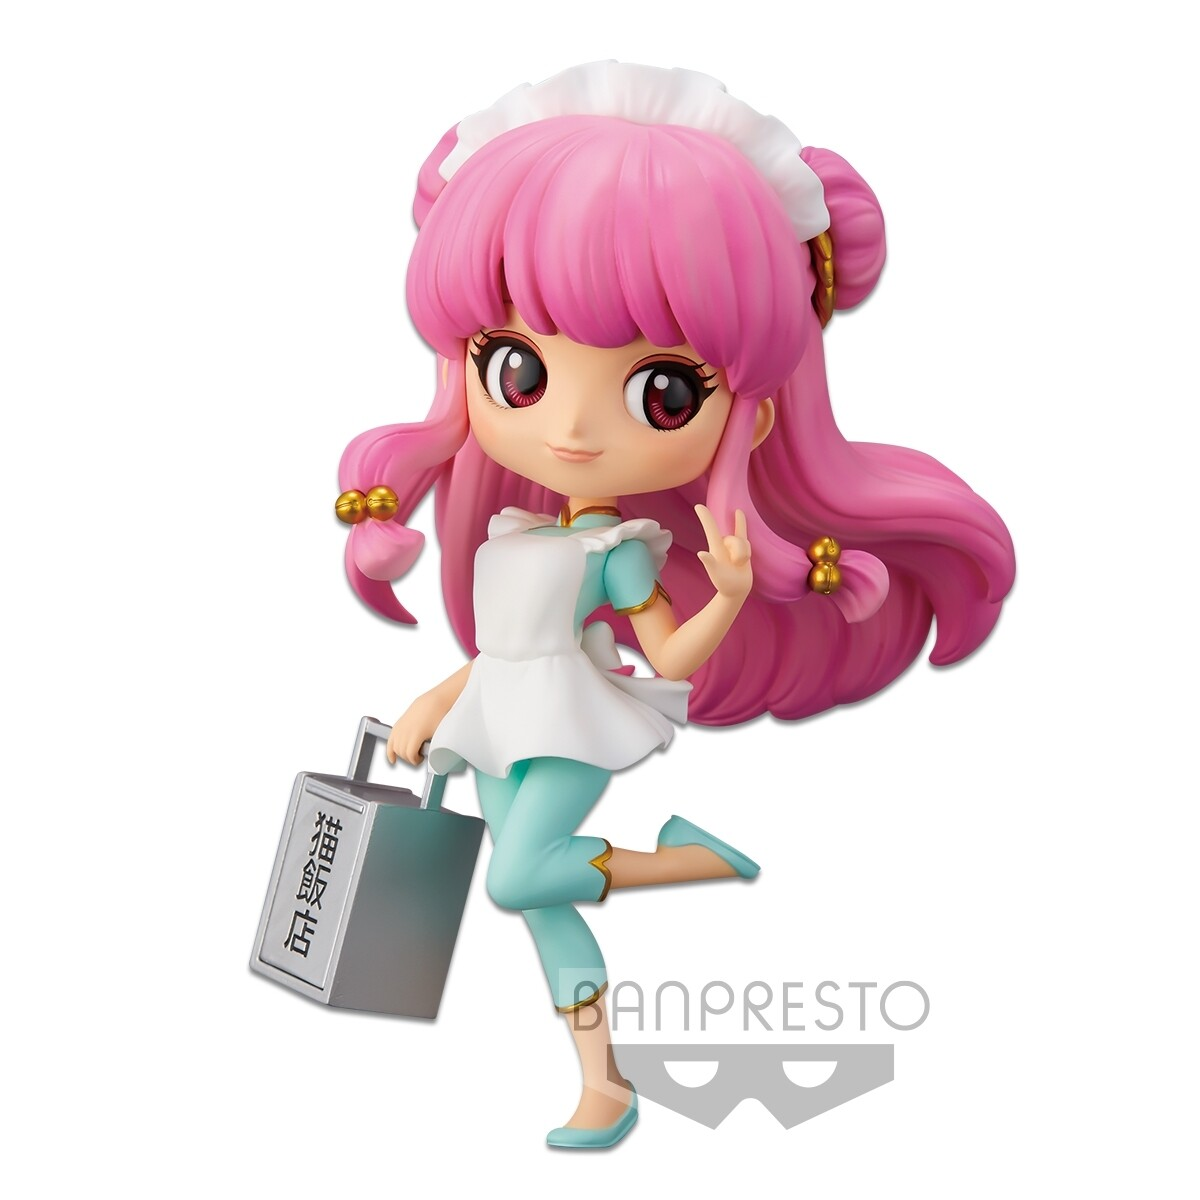 PRE-ORDER Banpresto Ranma 1/2 Q Posket Shampoo Ver. B